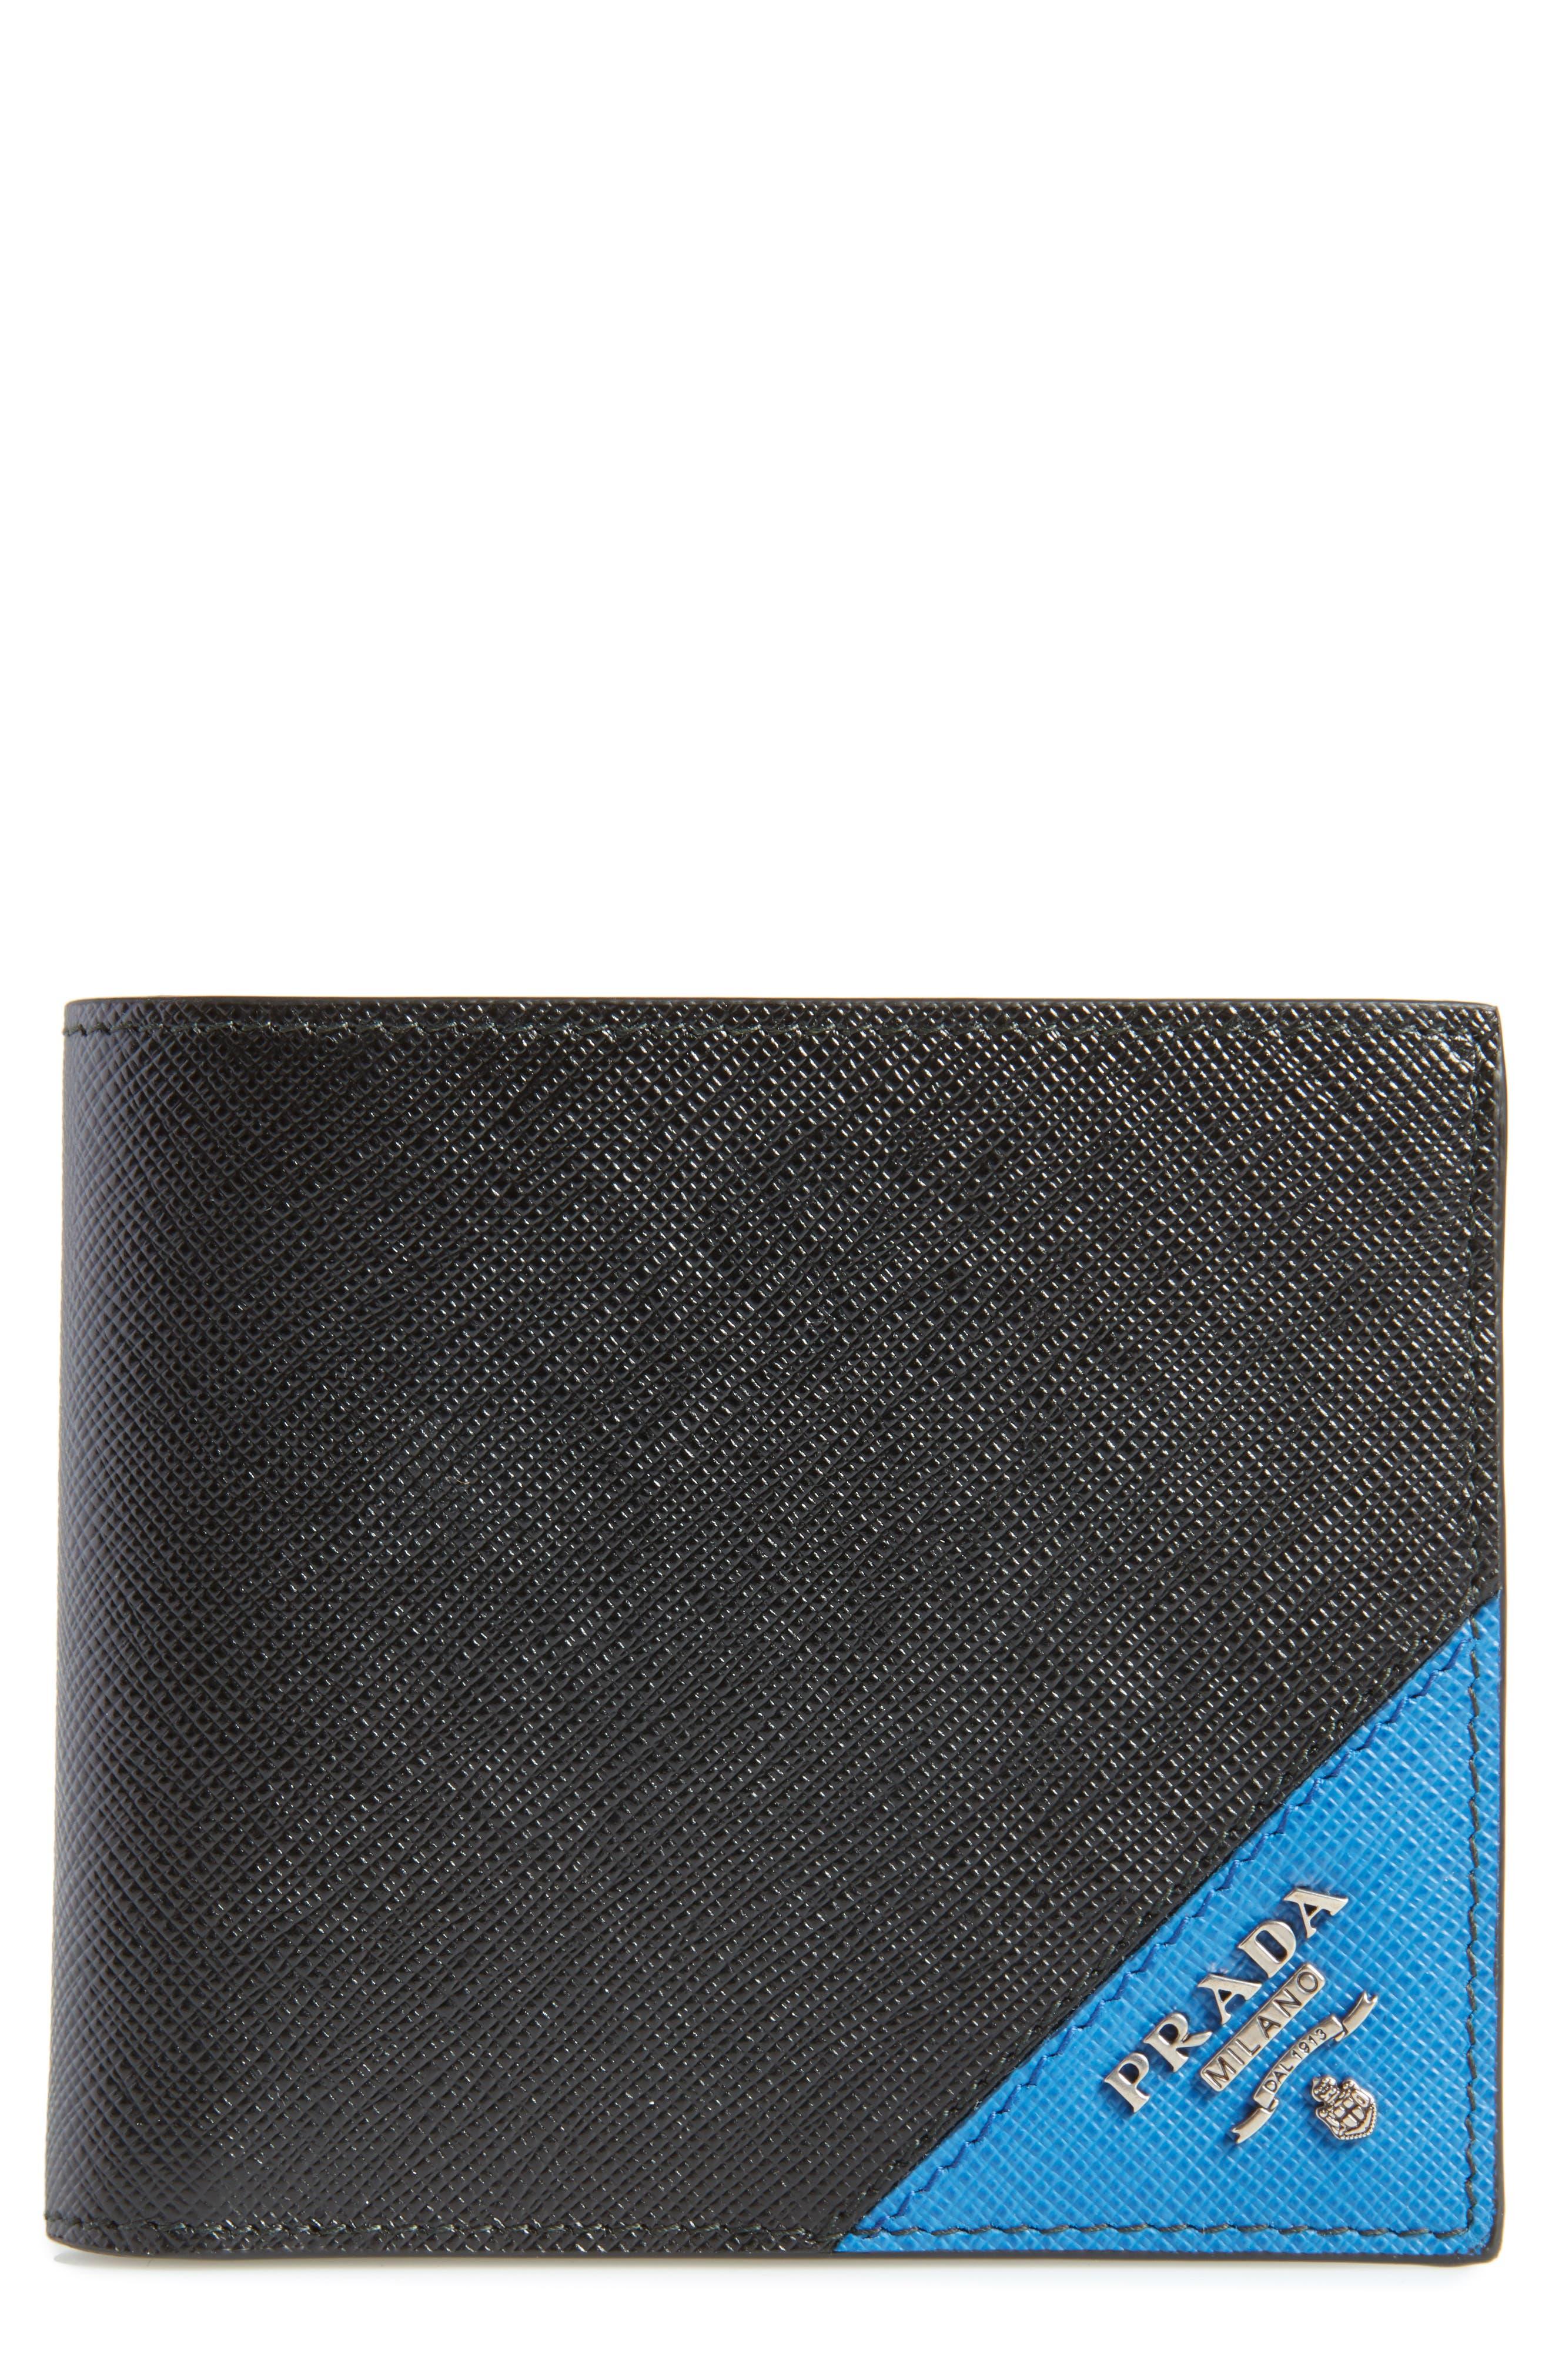 Prada® Wallets: Shop at USD $235.00  | Stylight